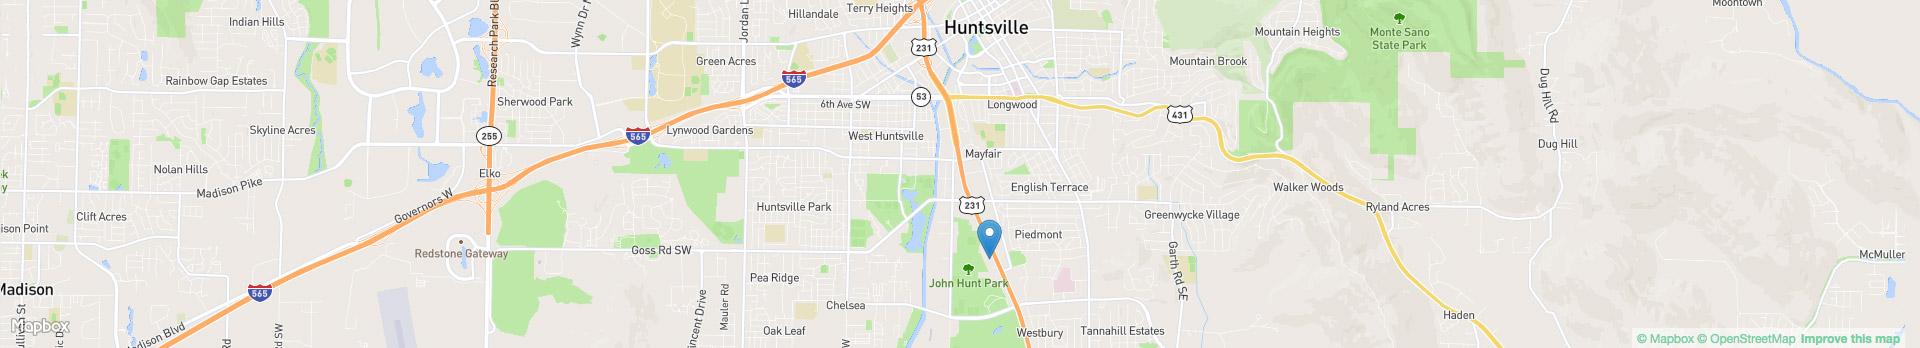 map-huntsville